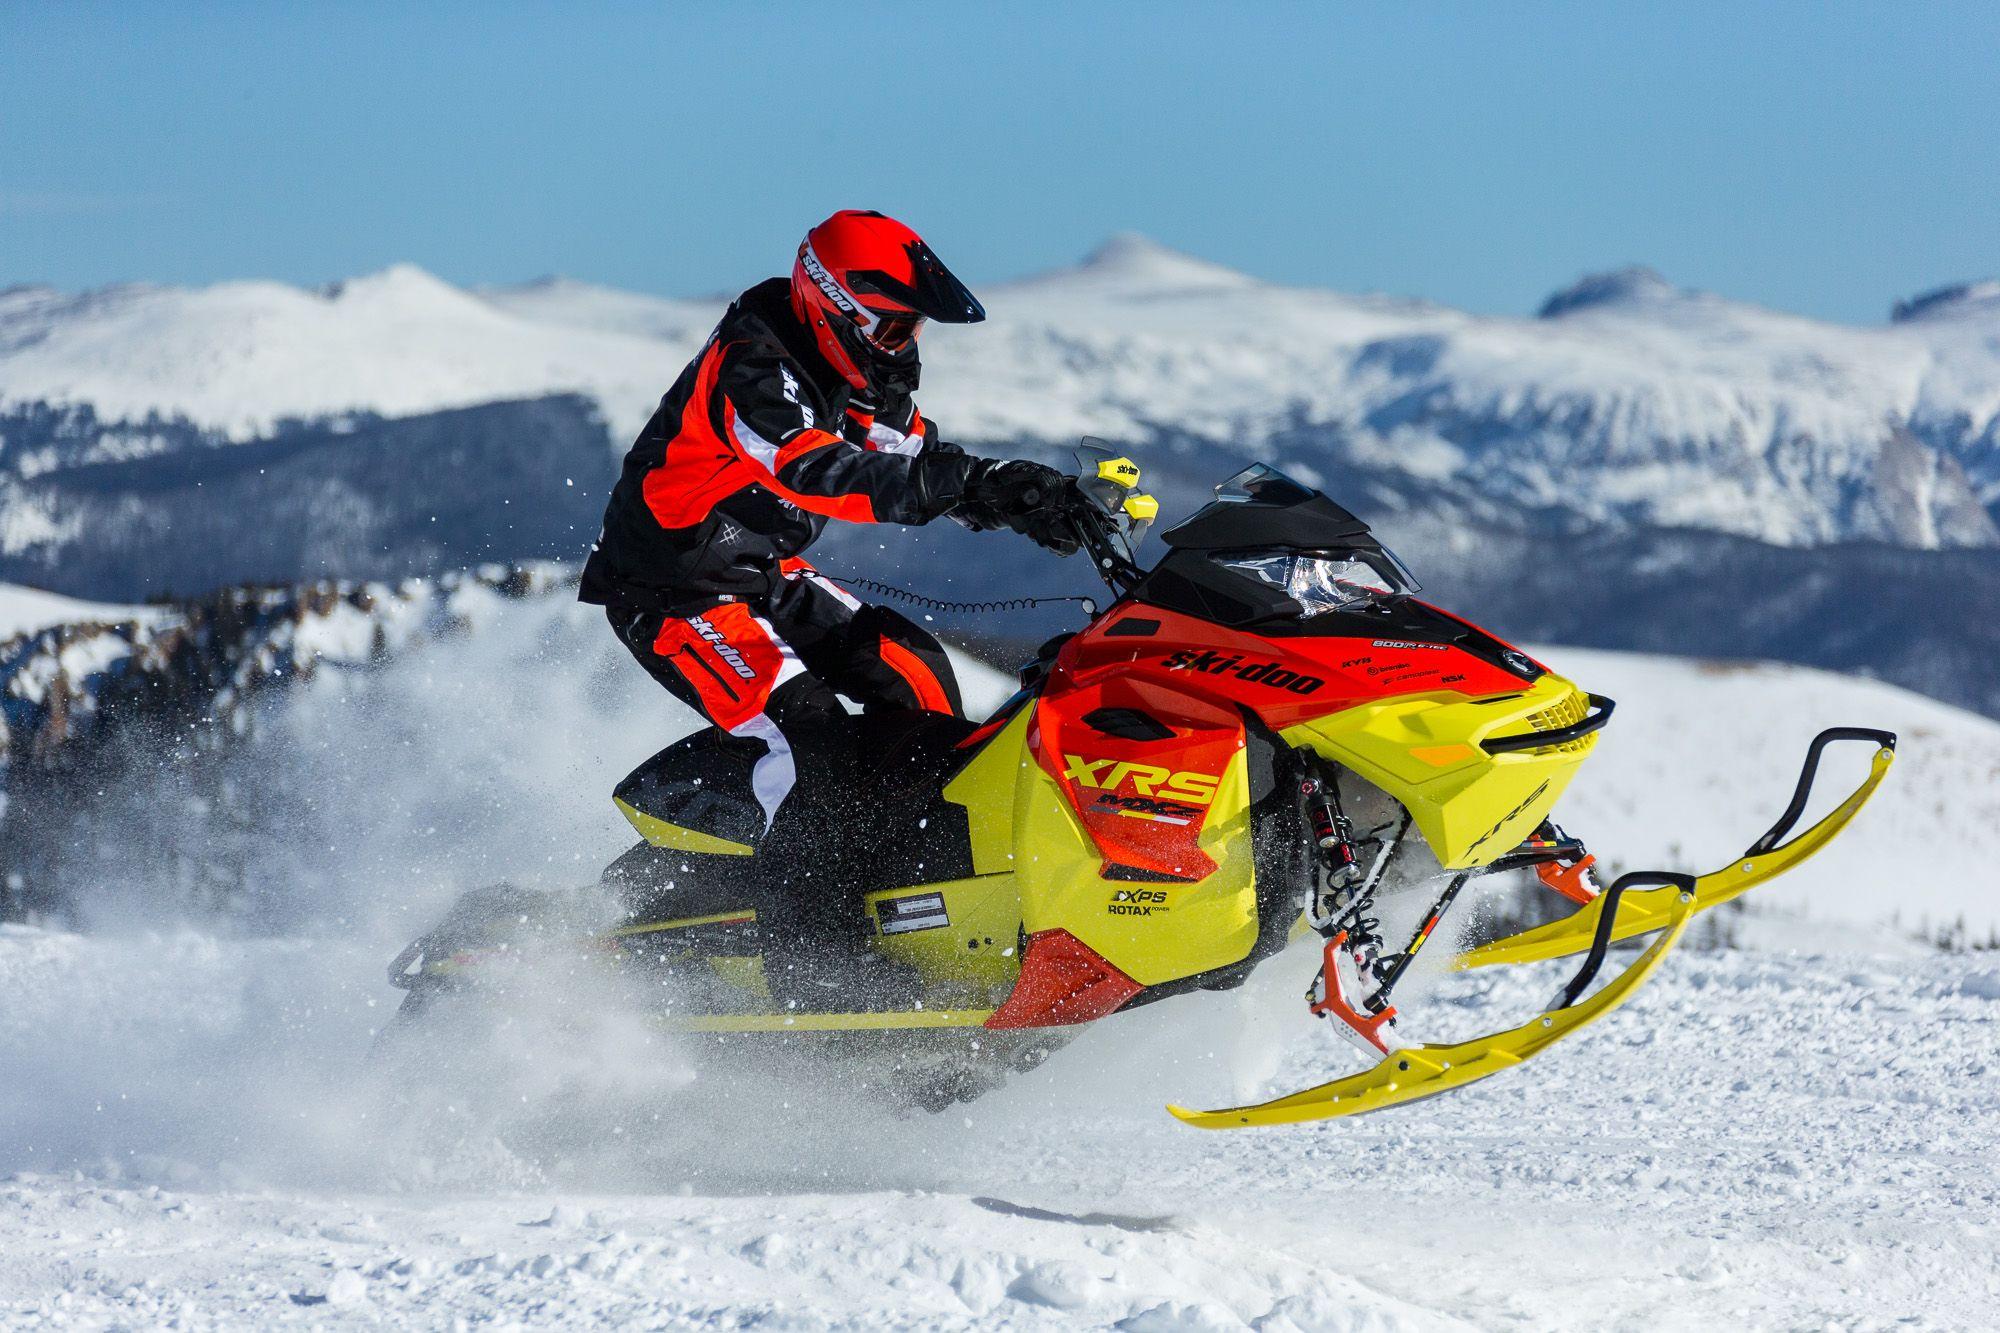 2015 Ski-Doo MXZ X-RS (ROTAX 800R E-TEC) |